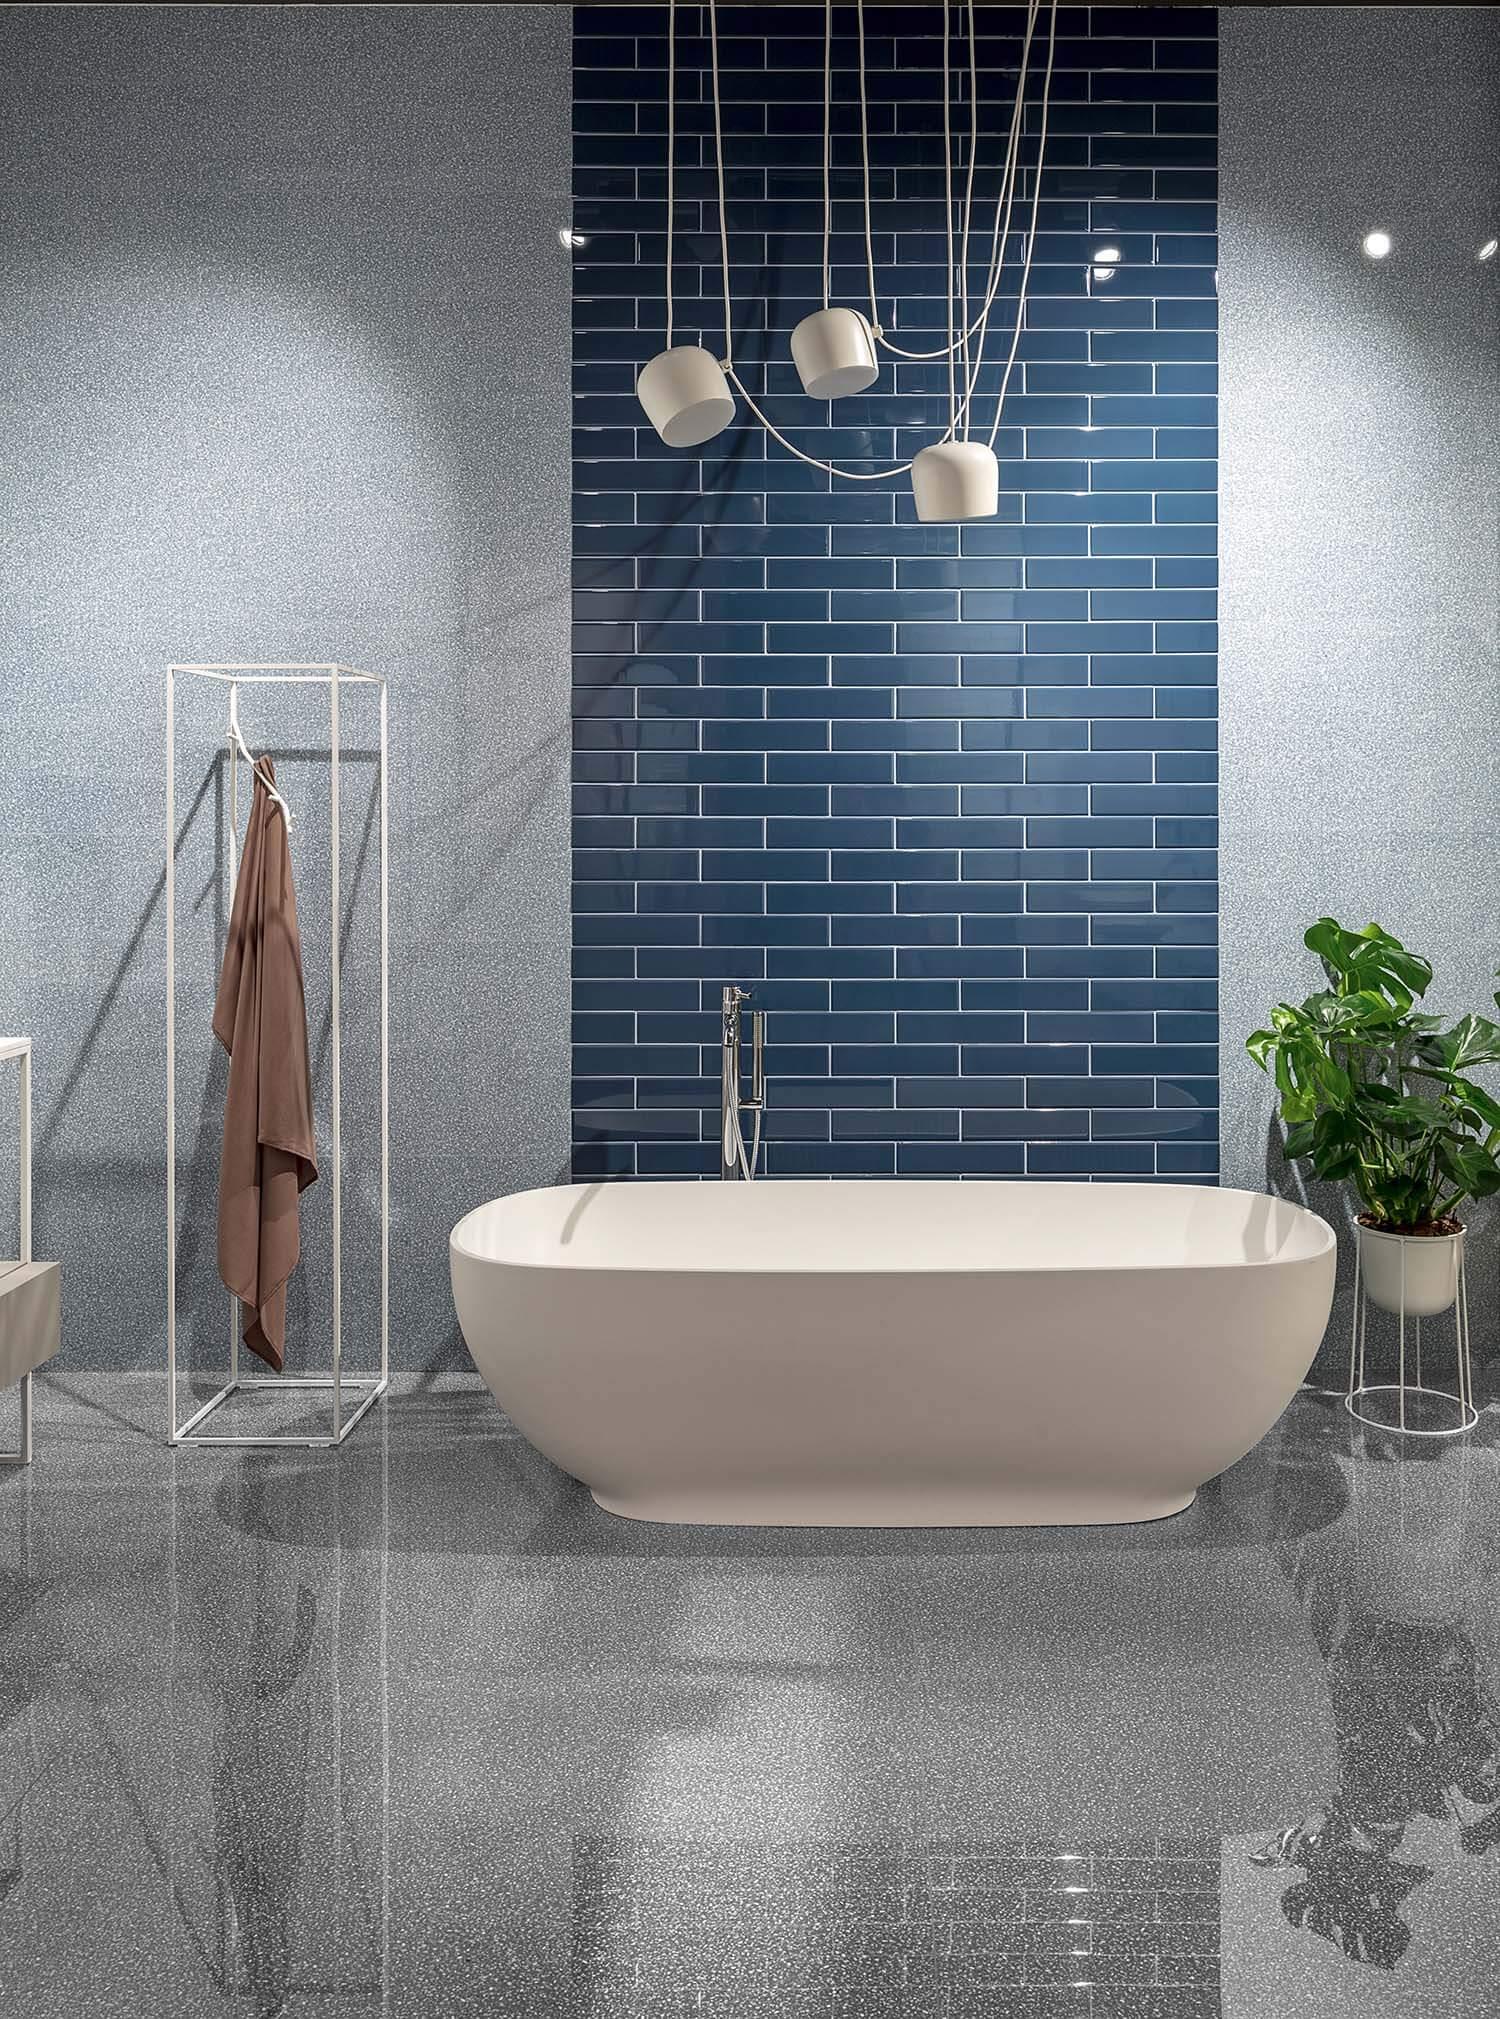 Rivestimento_panaria_panaria_Newdot Azure-Kry_bathroom